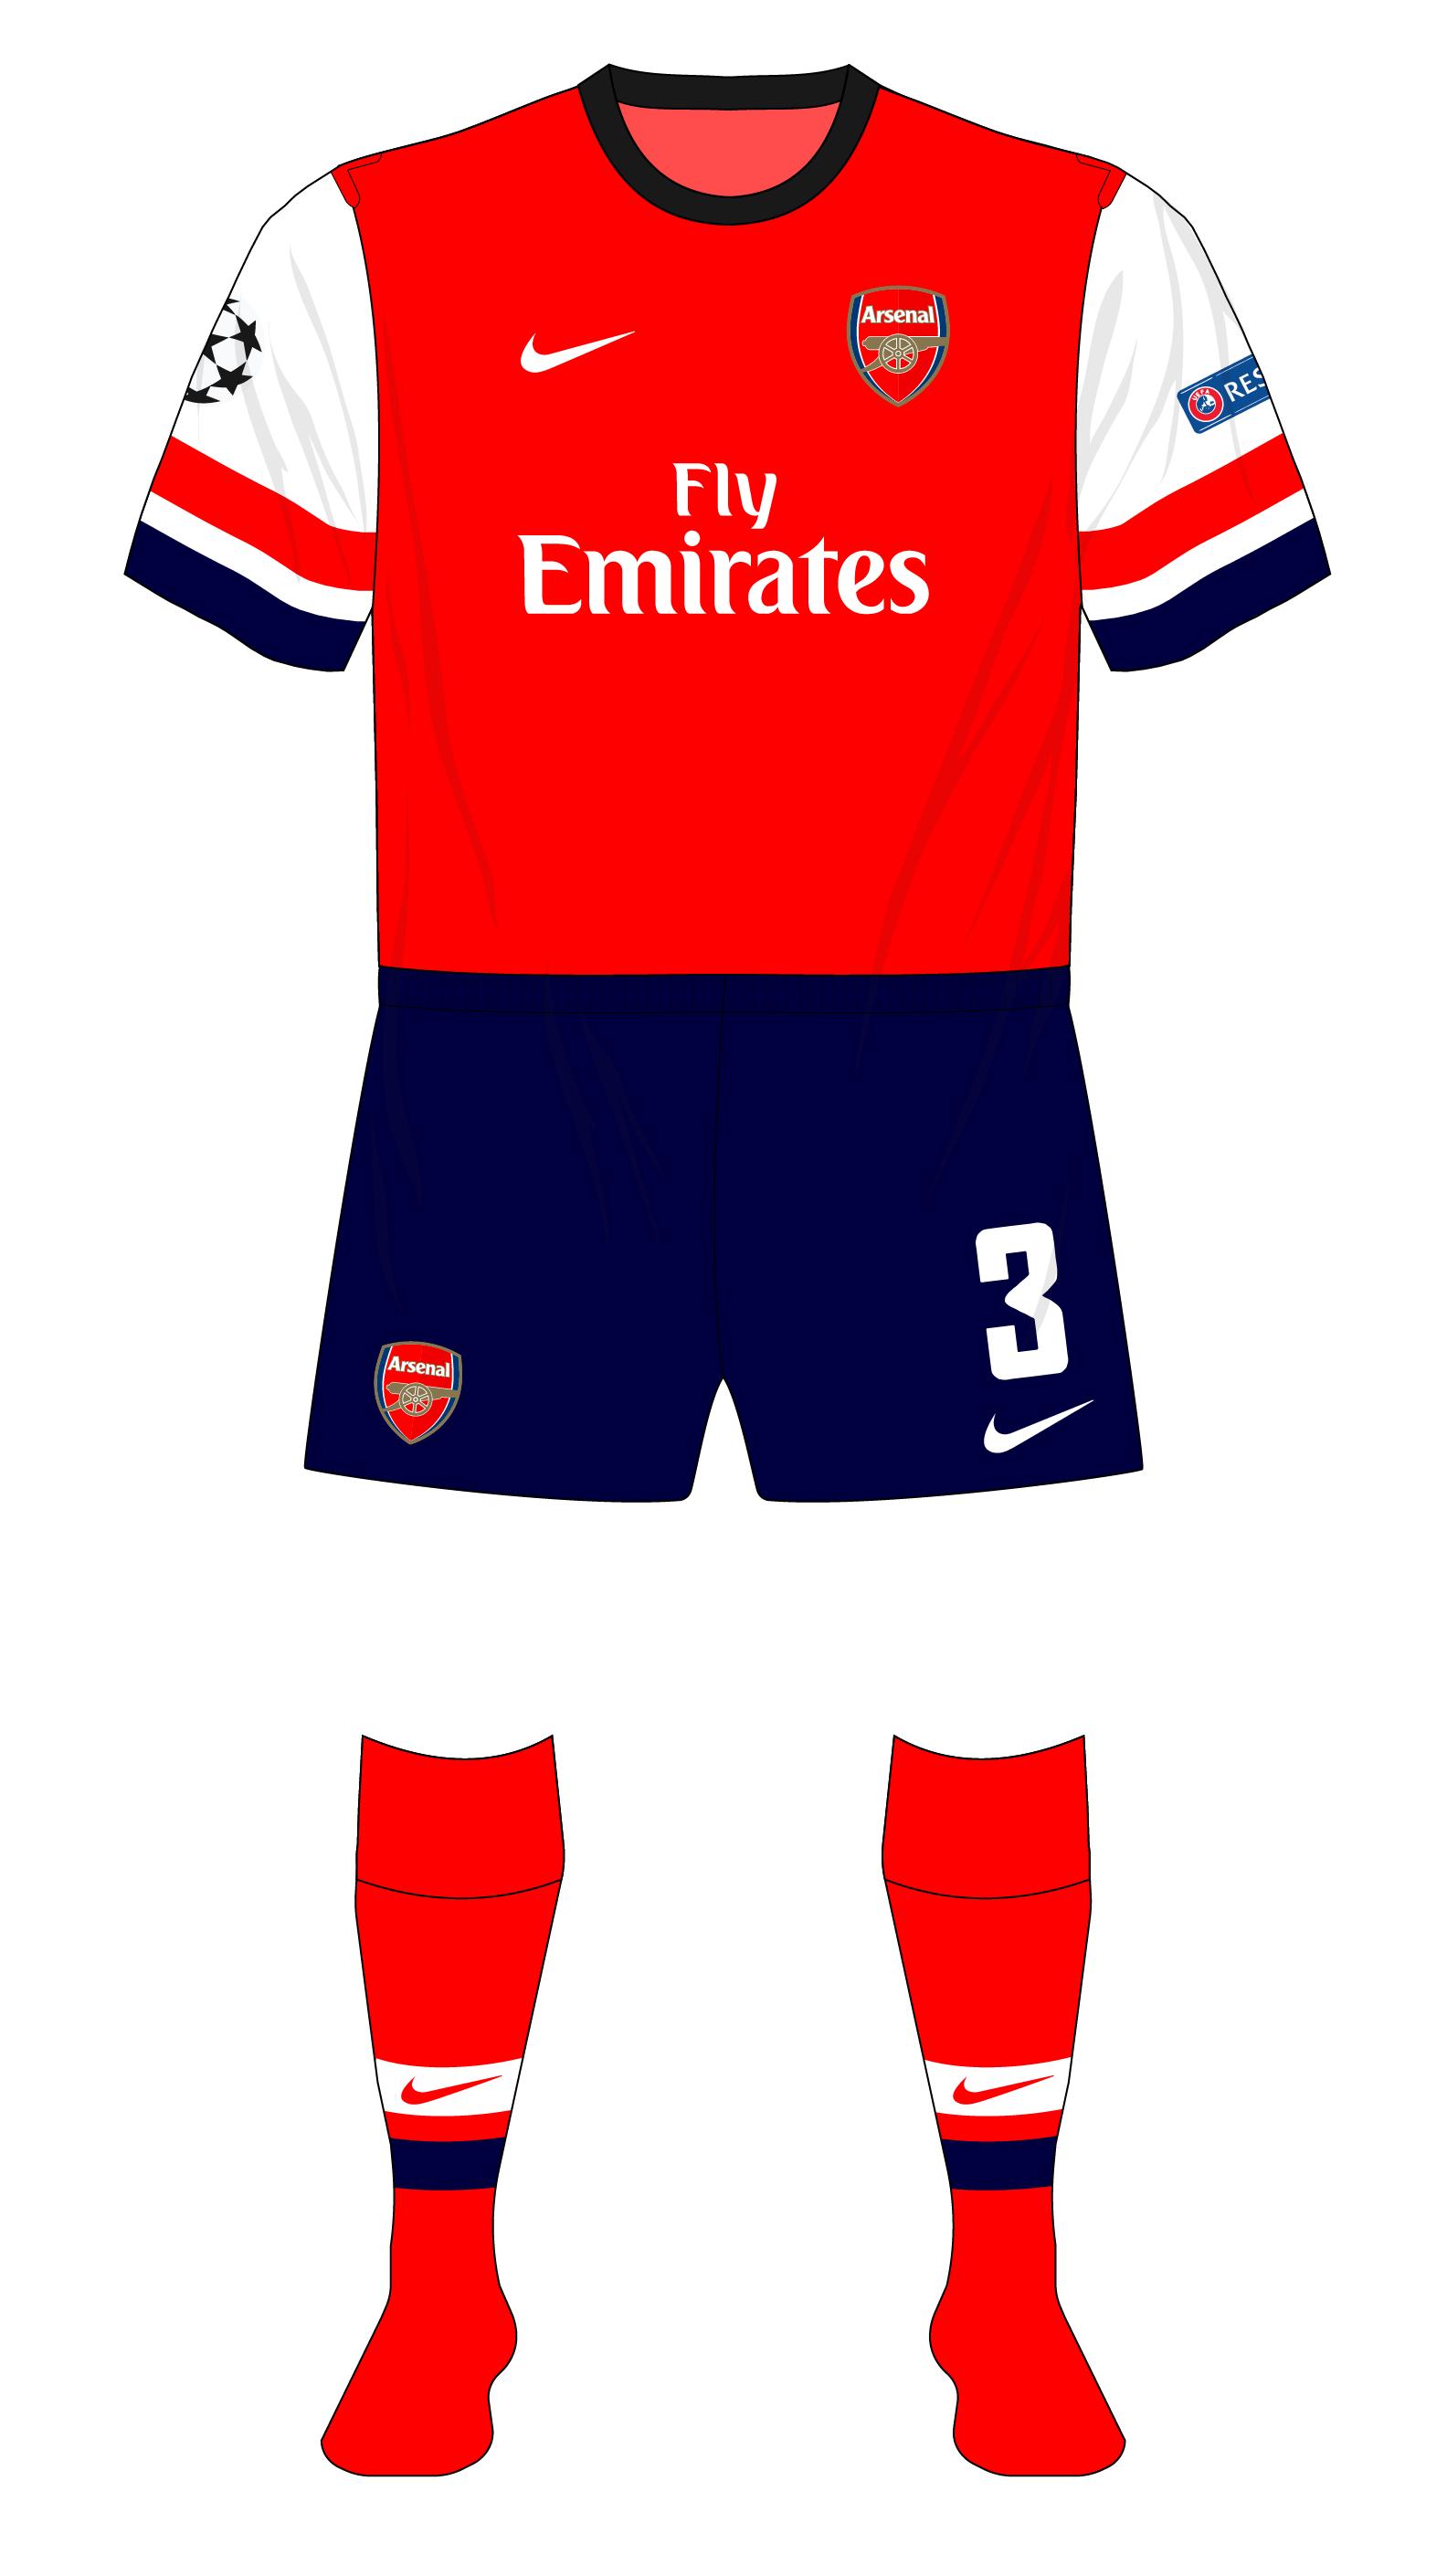 2014 2013 Fenerbahce Arsenal Kit Navy Nike Shorts 01 Home 57w1x